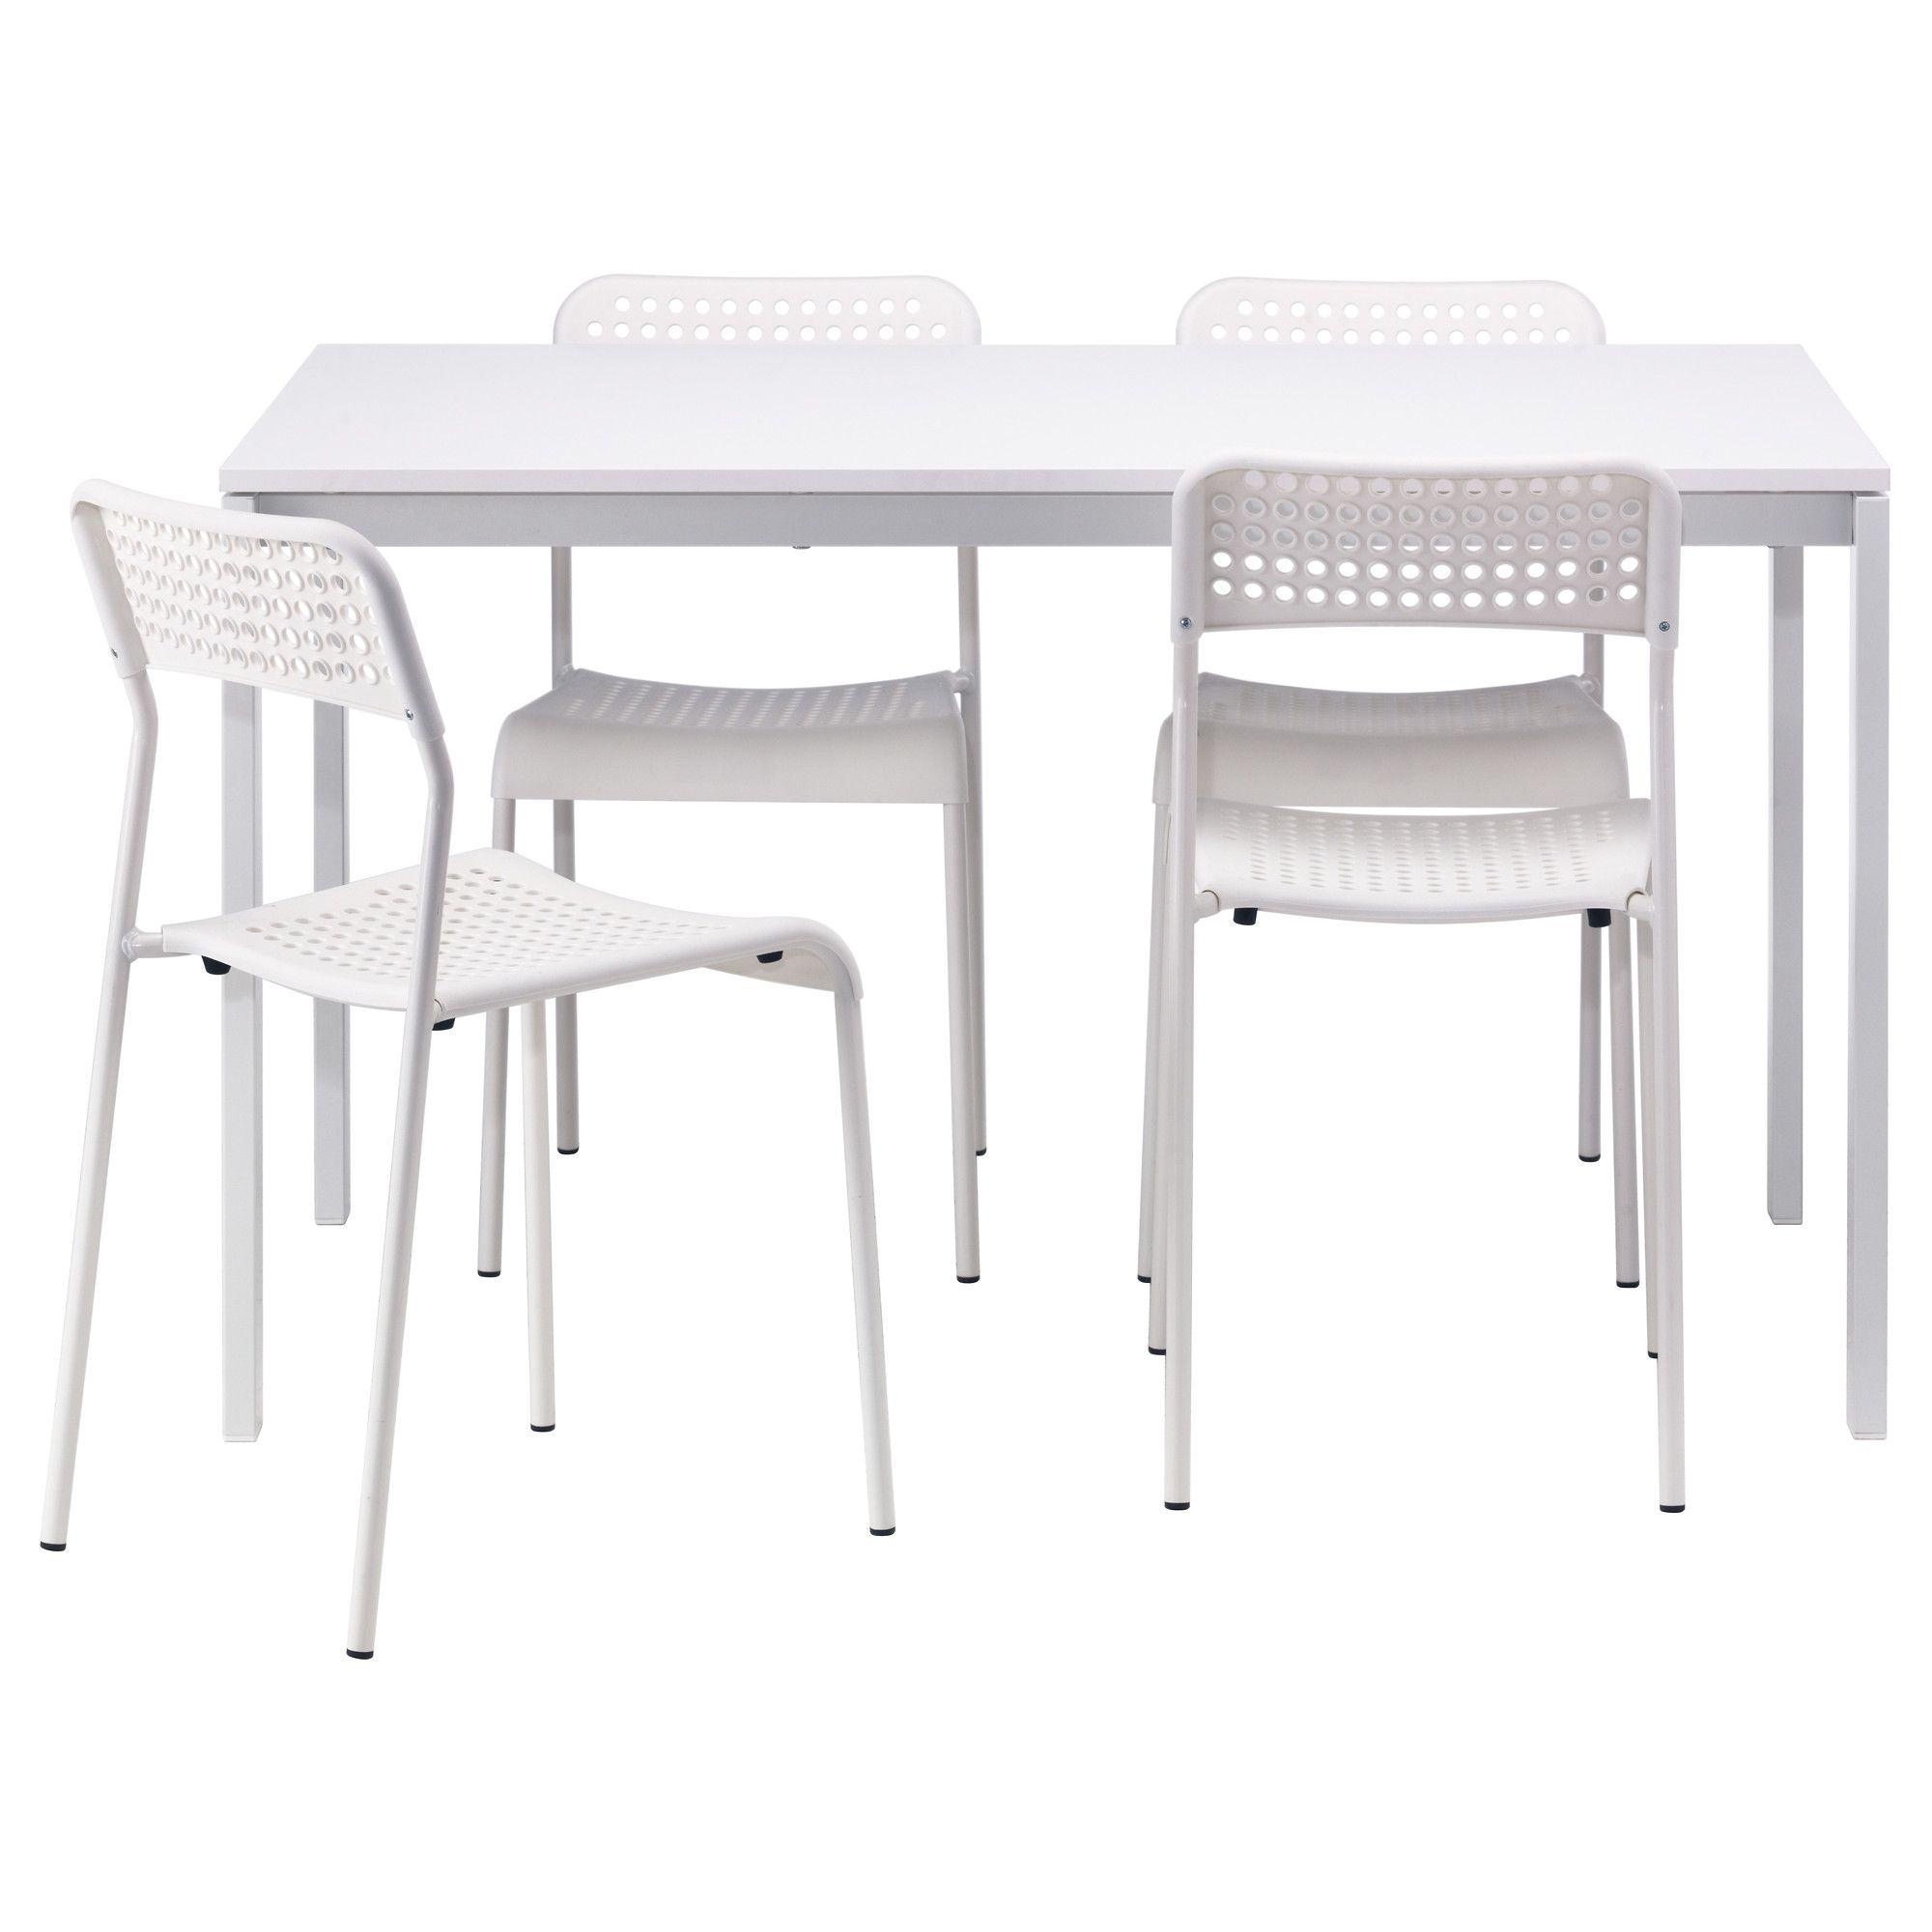 MELLTORP ADDE Mesa con 4 sillas blanco Decoracin